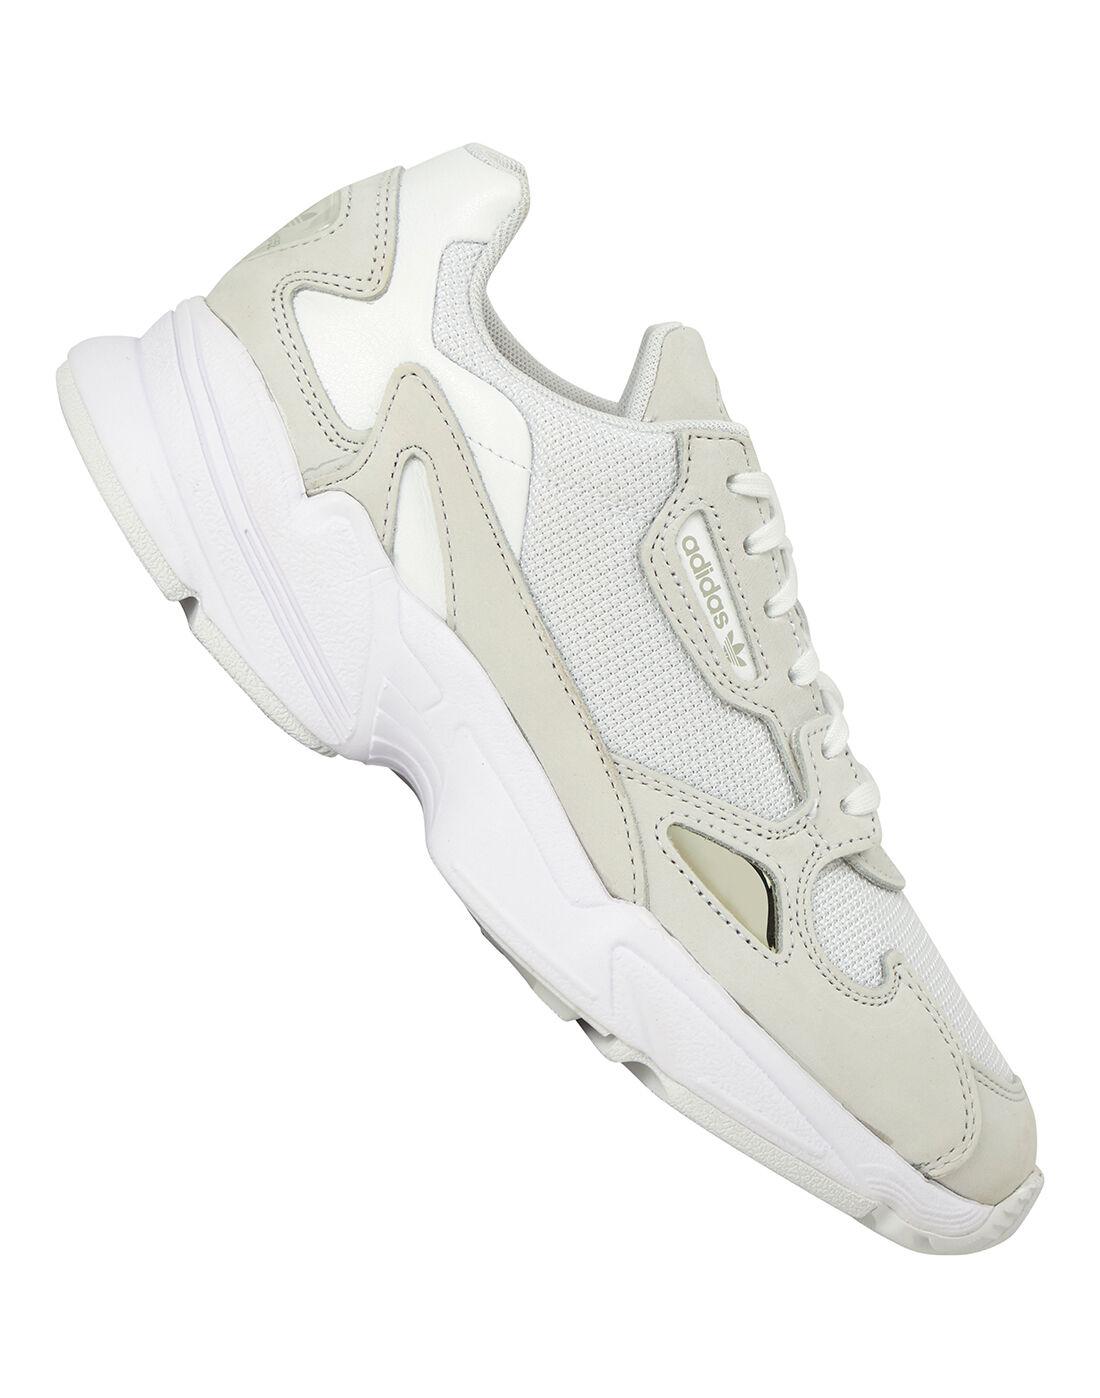 Cream White adidas Originals Falcon